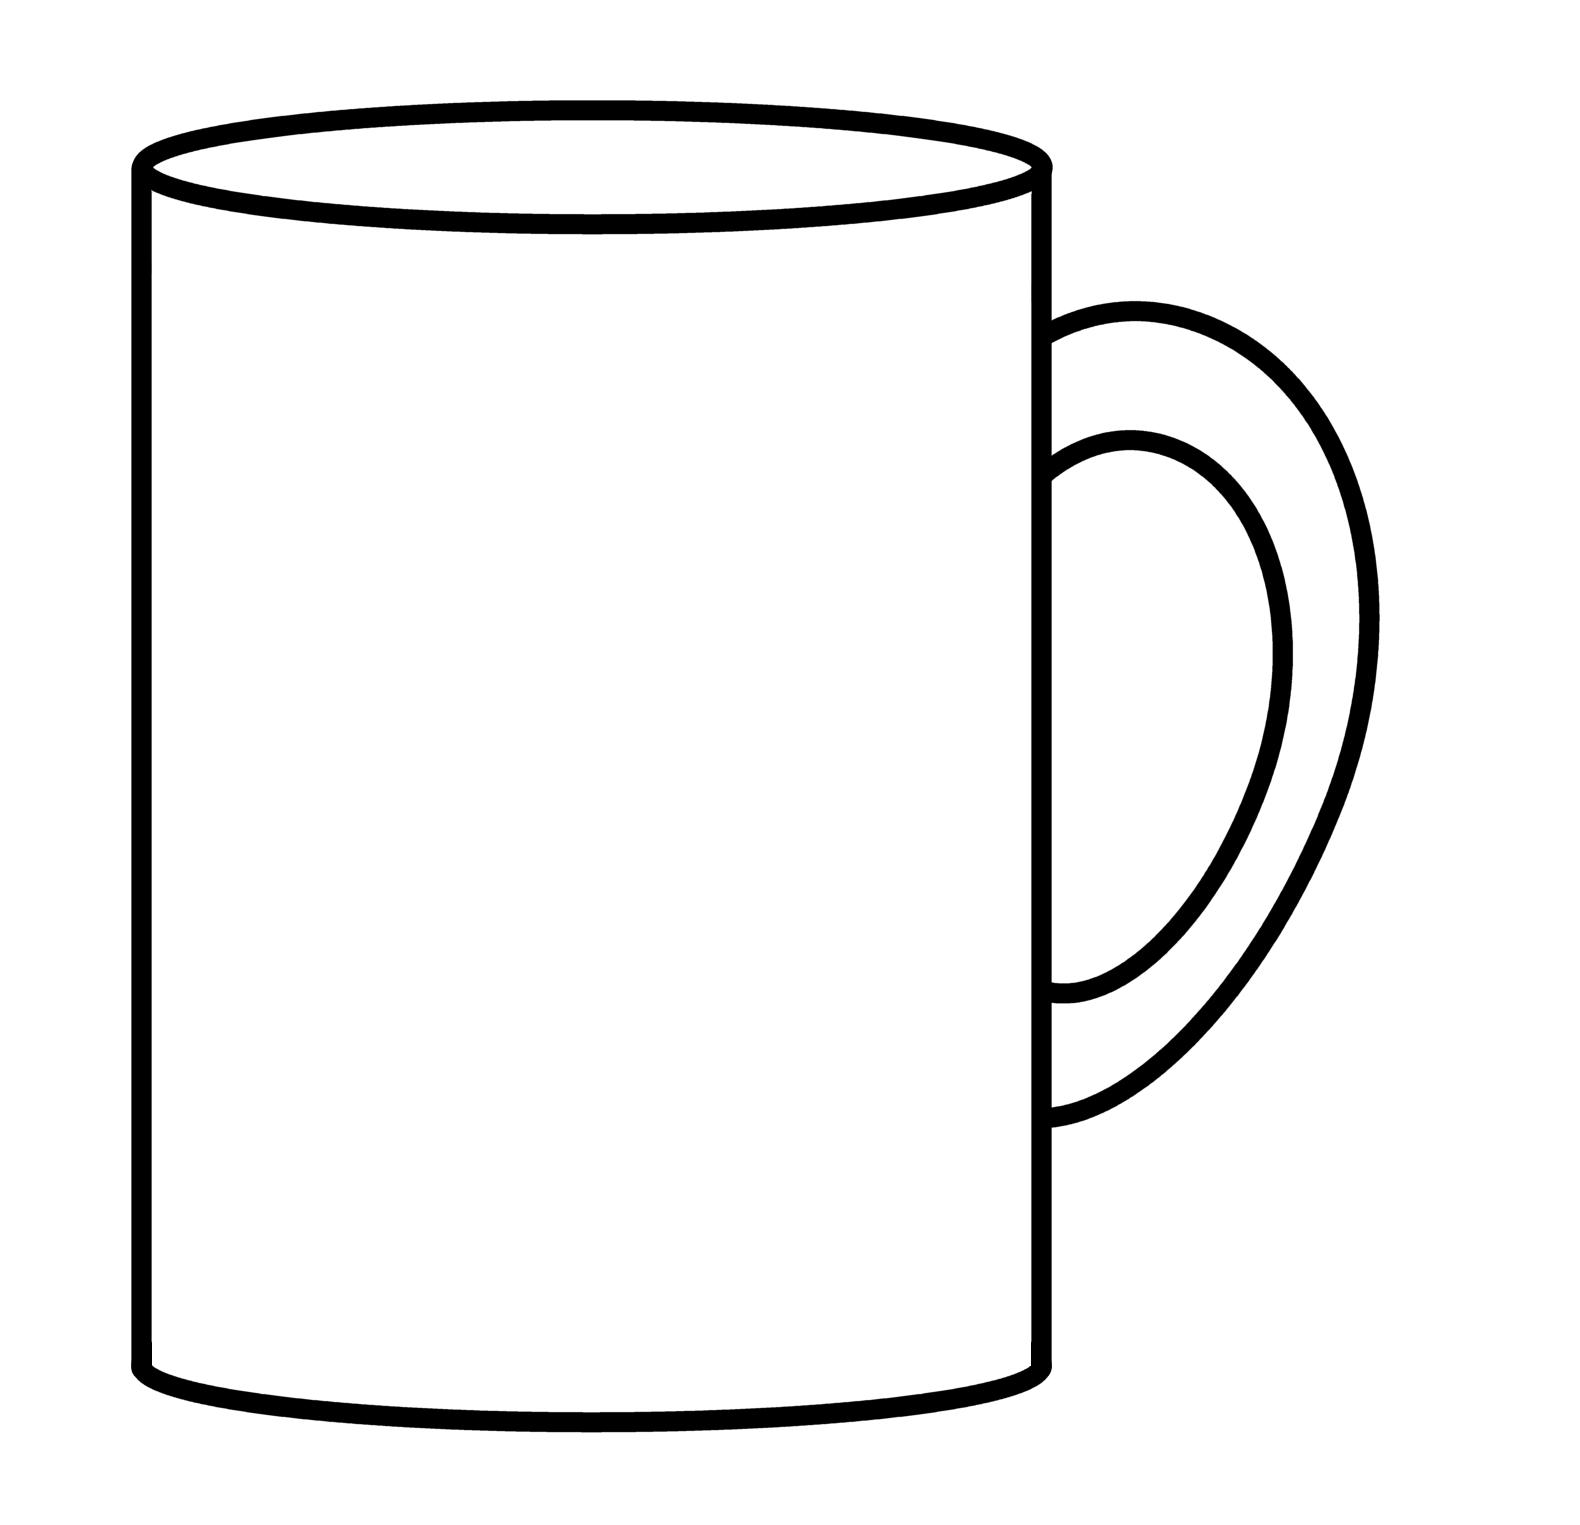 Drawn mug Cup To Draw To Coffee